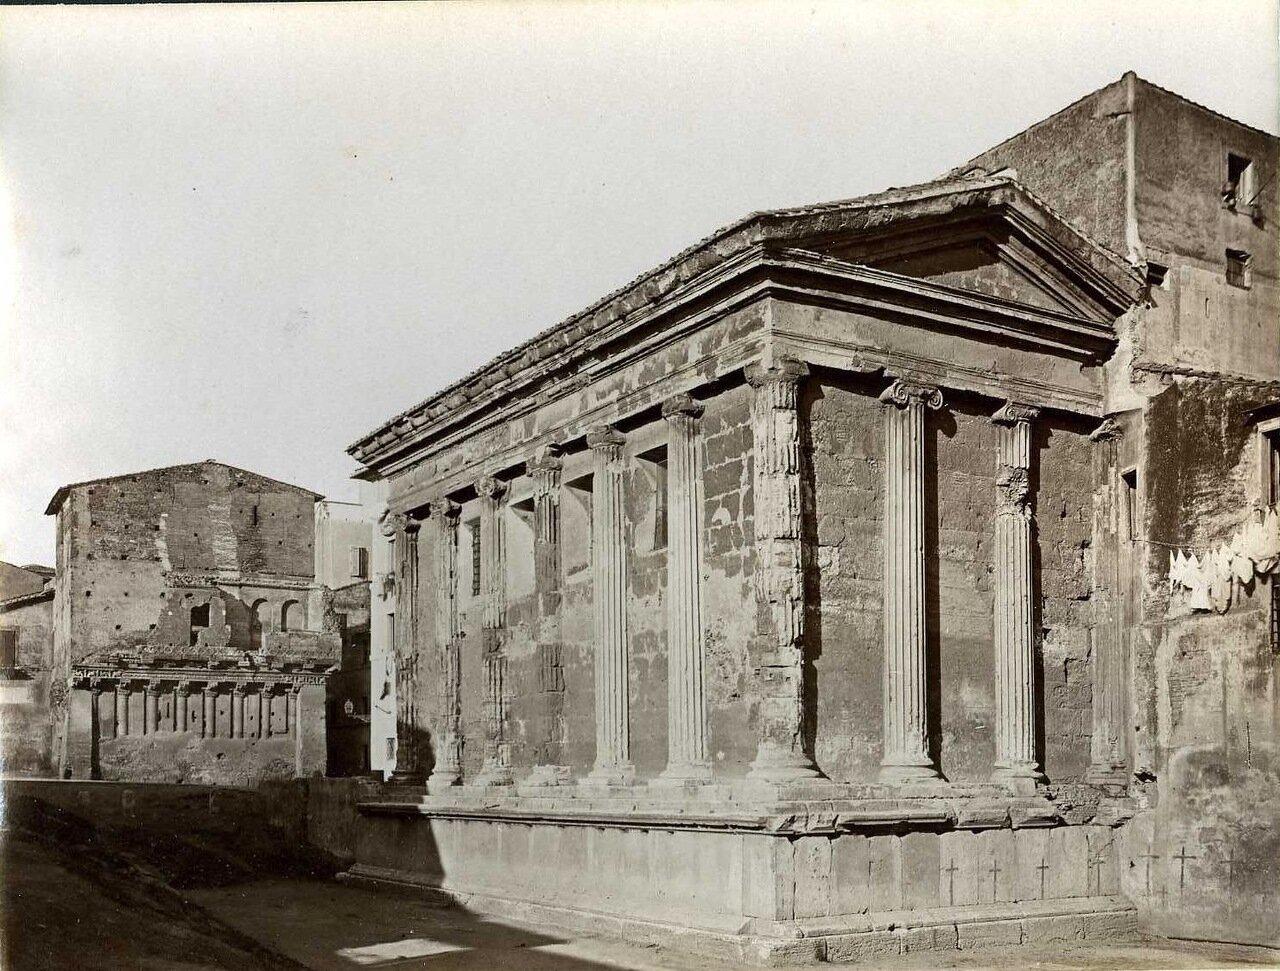 Храм Портуна — древнеримский храм на Бычьем форуме